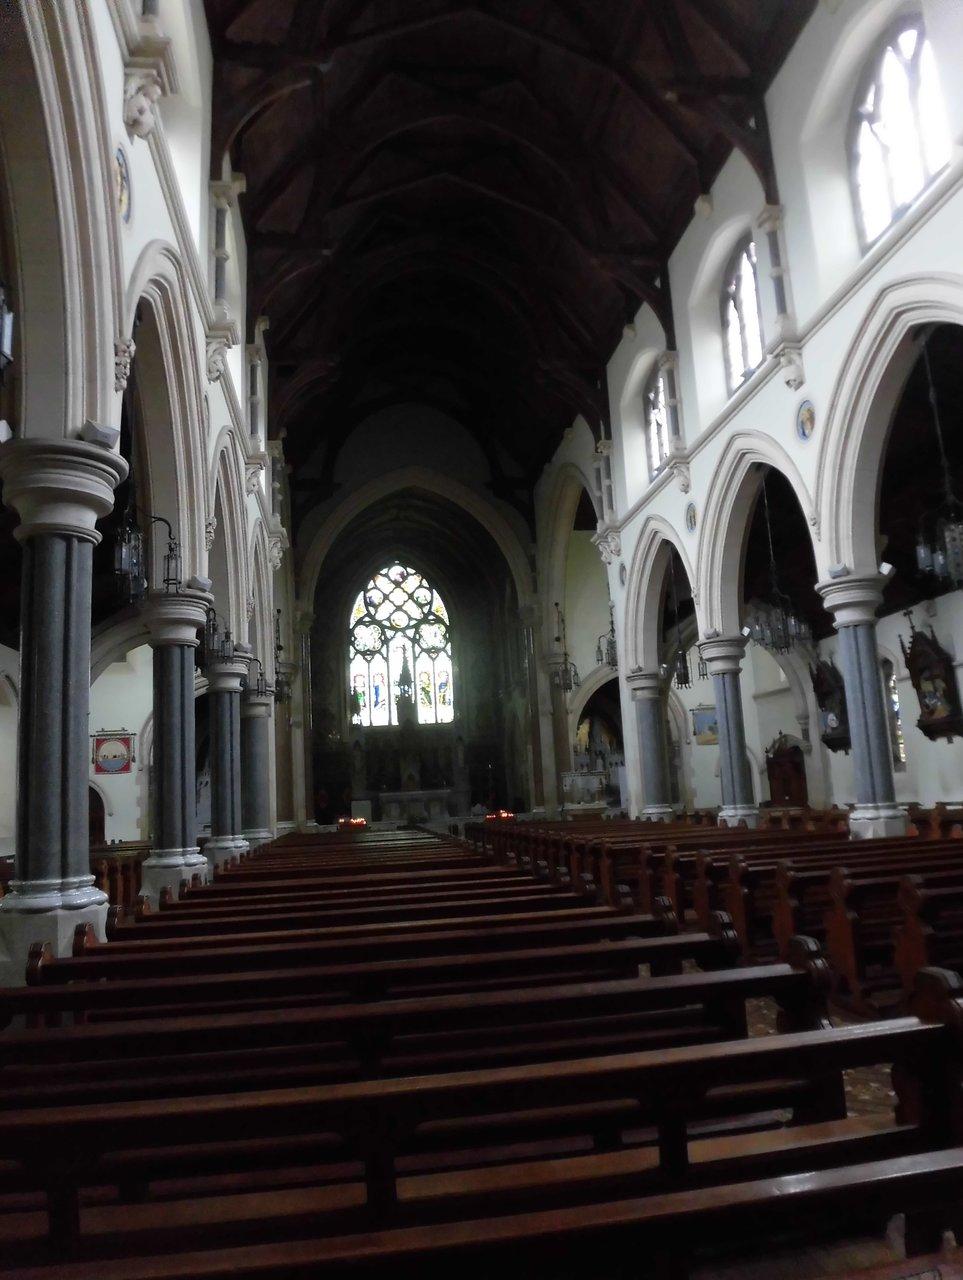 Boyne Valley | Hill Of Tara | Trim Castle | Loughcrew | Day Tour